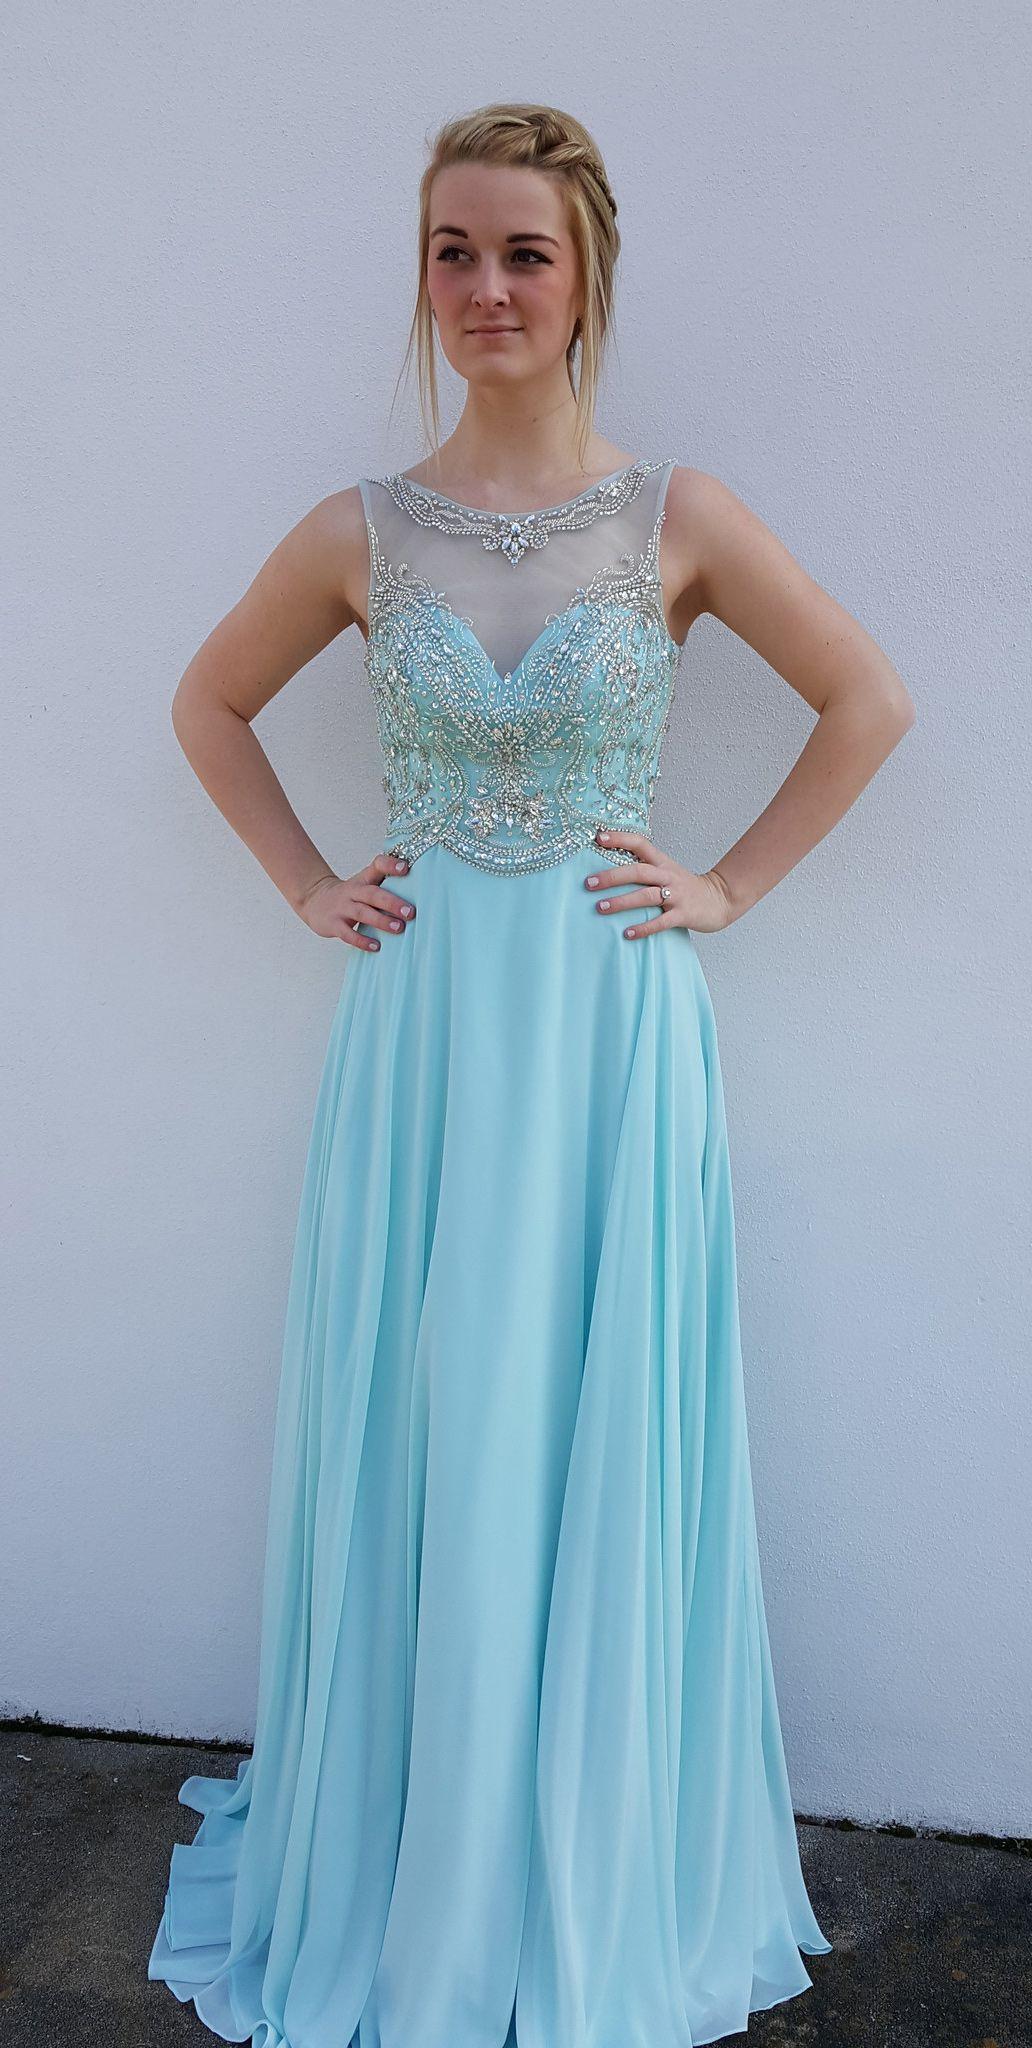 Elegant Floor Length Prom Party Dress - Blue Scoop Backless Tops ...